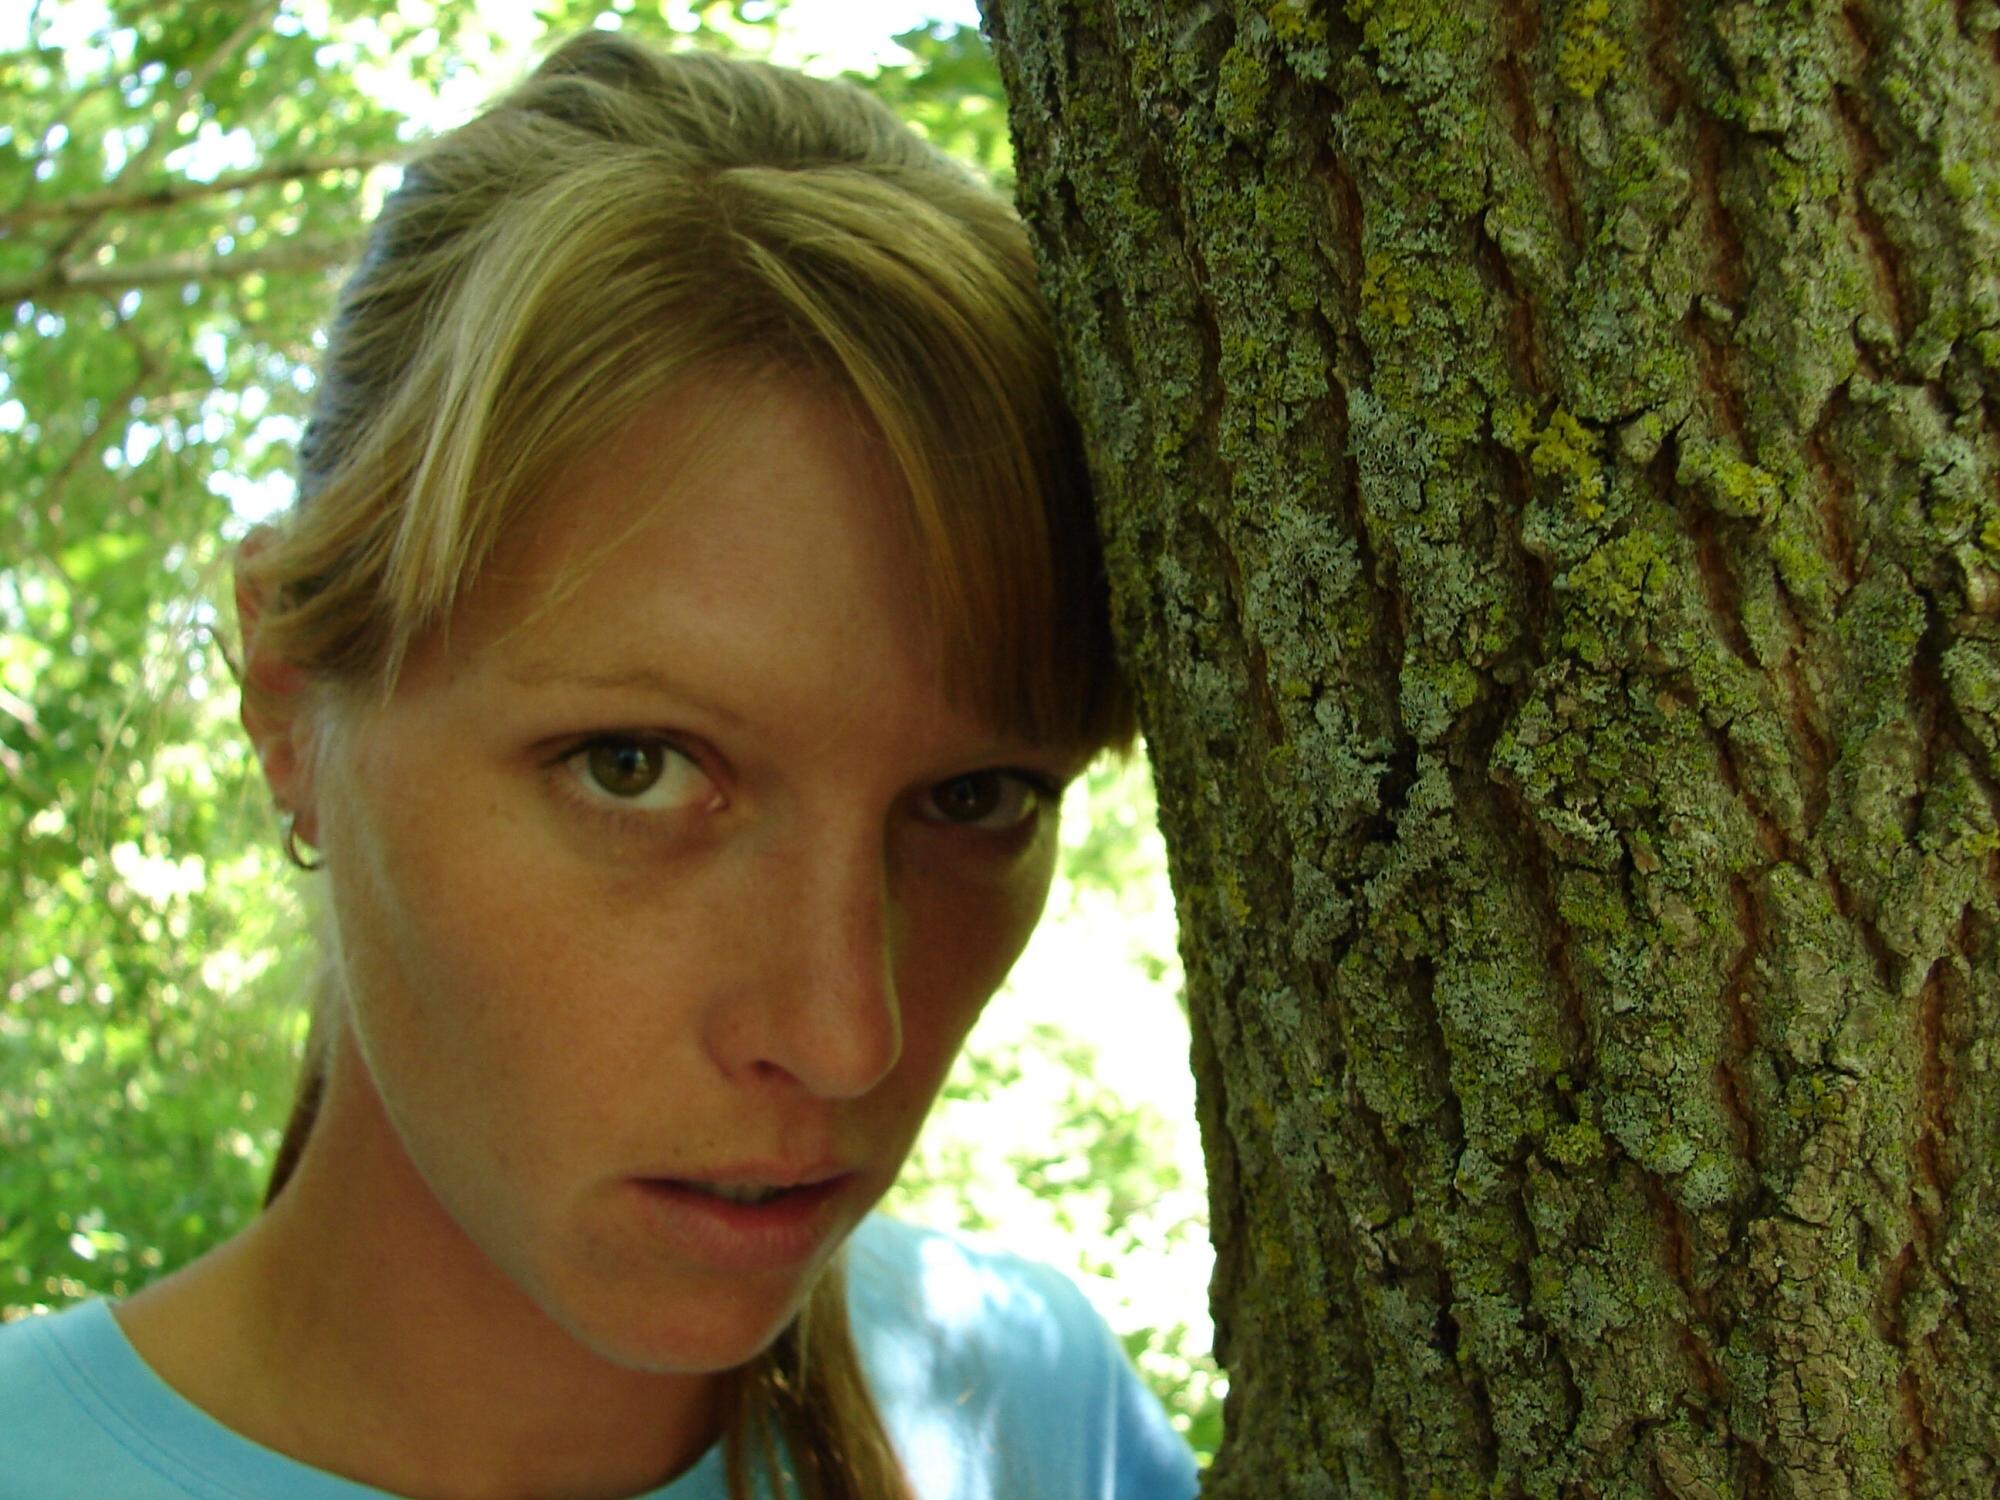 Danielle Dryad Tree Portrait 2 by FantasyStock